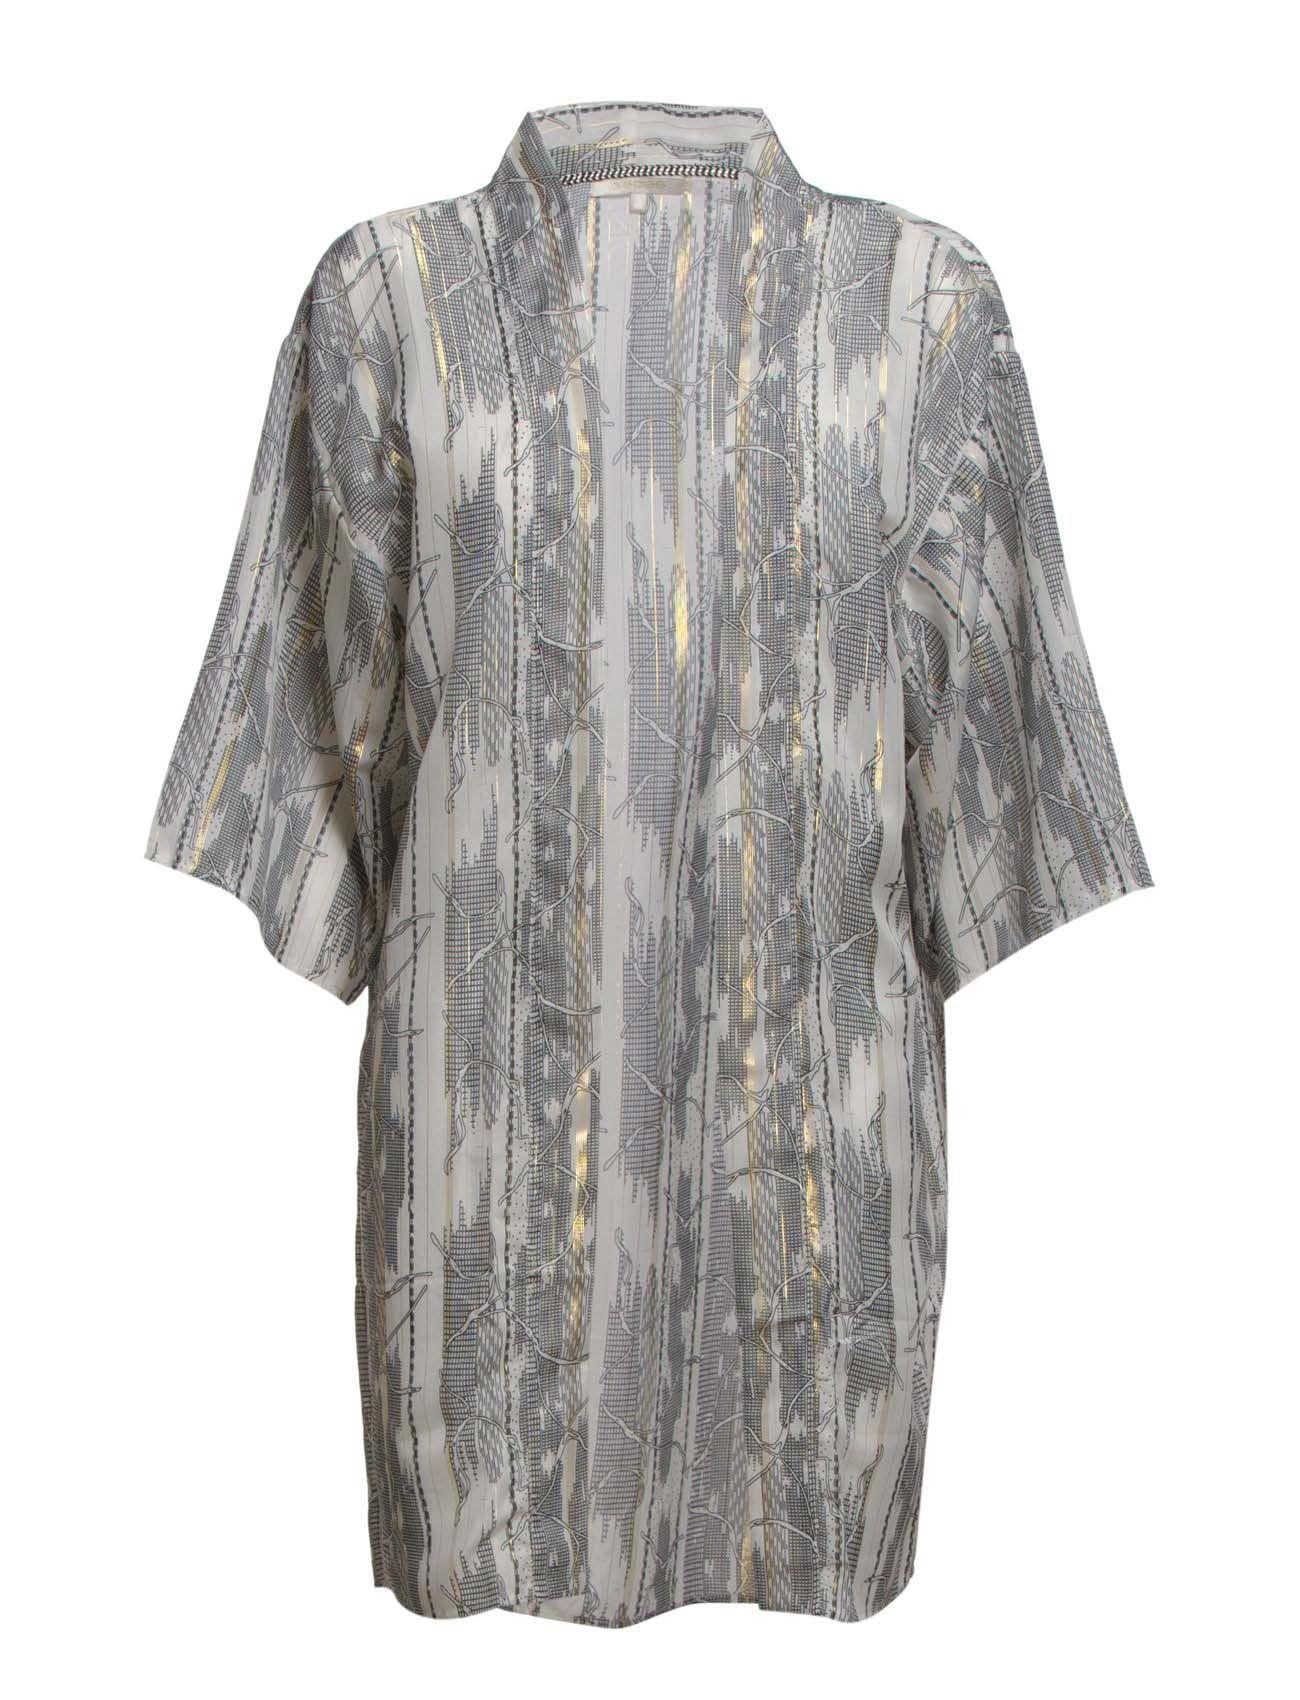 Pcpurex 3/4 Long Kimono Exp